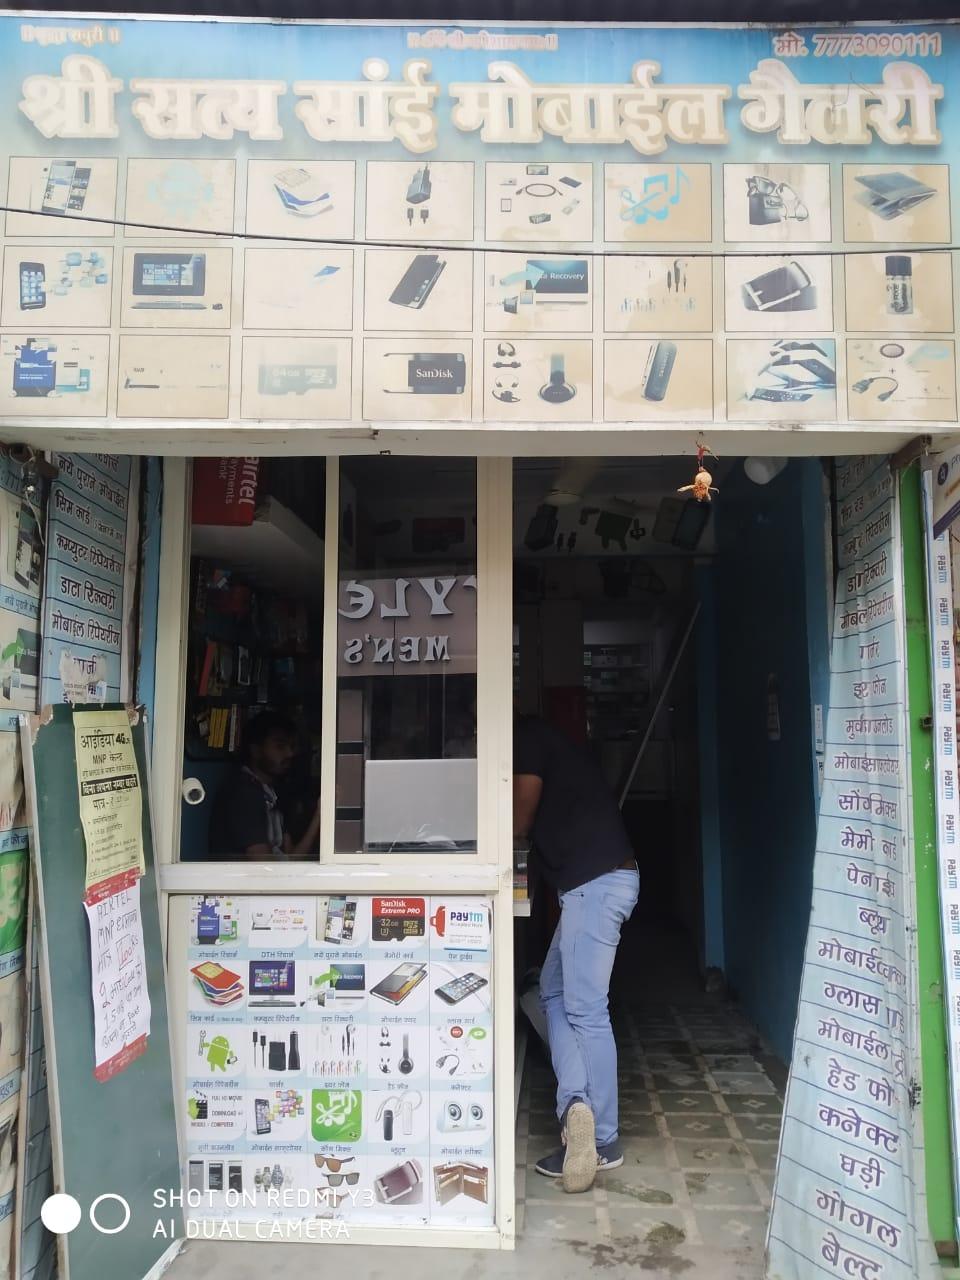 Shri Satya sai mobile gallery